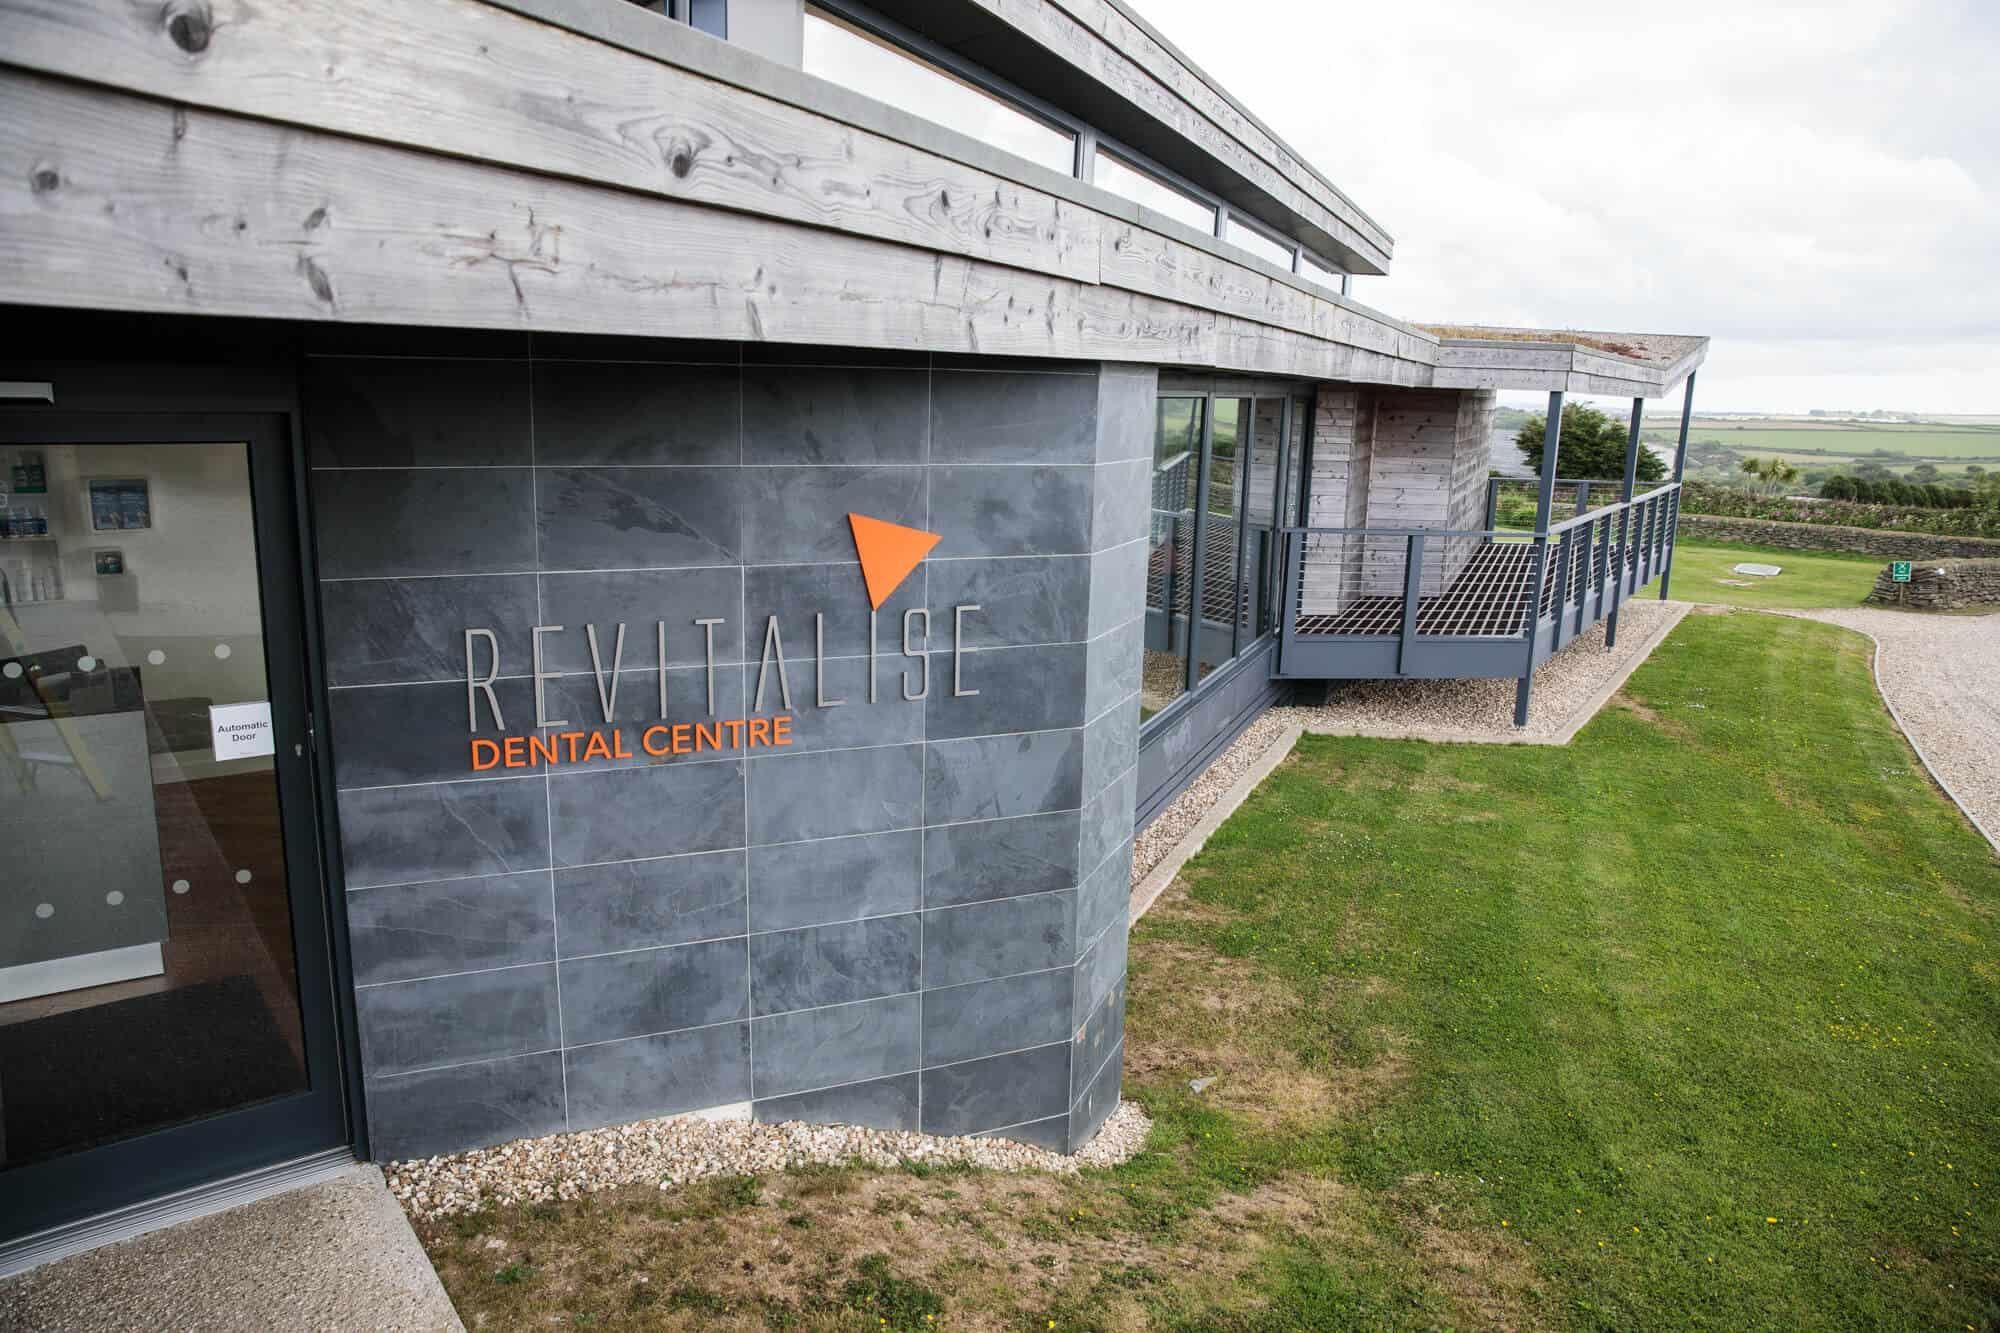 Revitalise Dental Centre - State Of The Art Treatment Centre